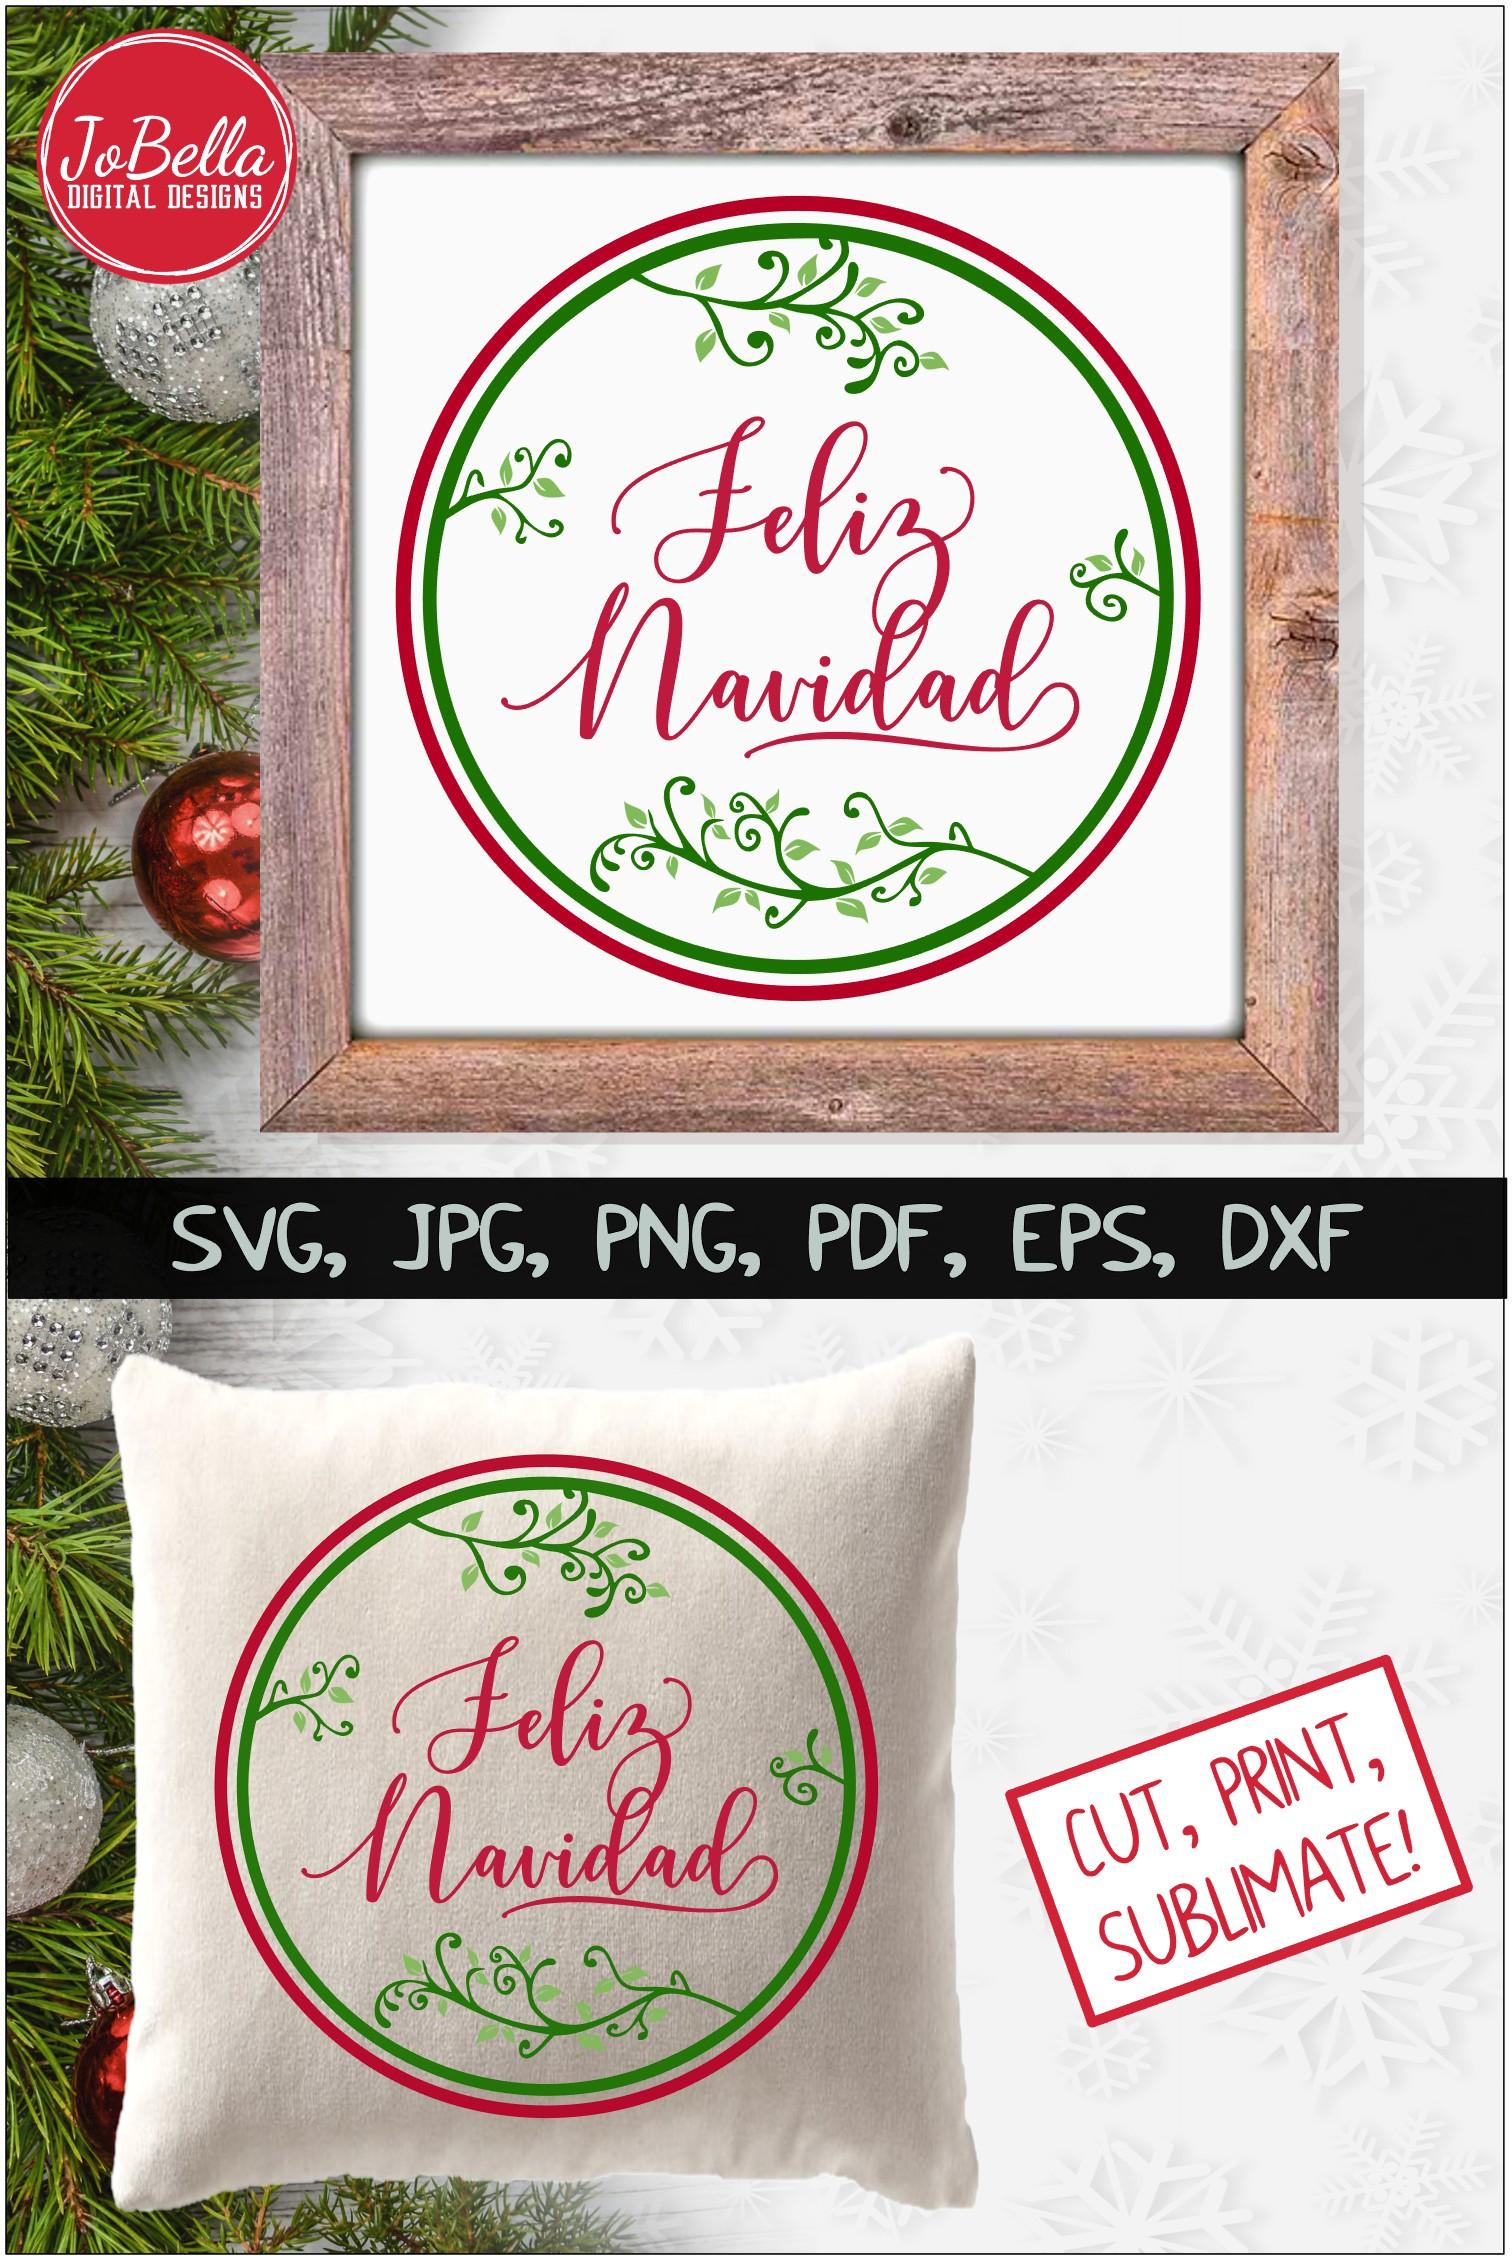 Feliz Navidad SVG Printable & Sublimation PNG example image 4